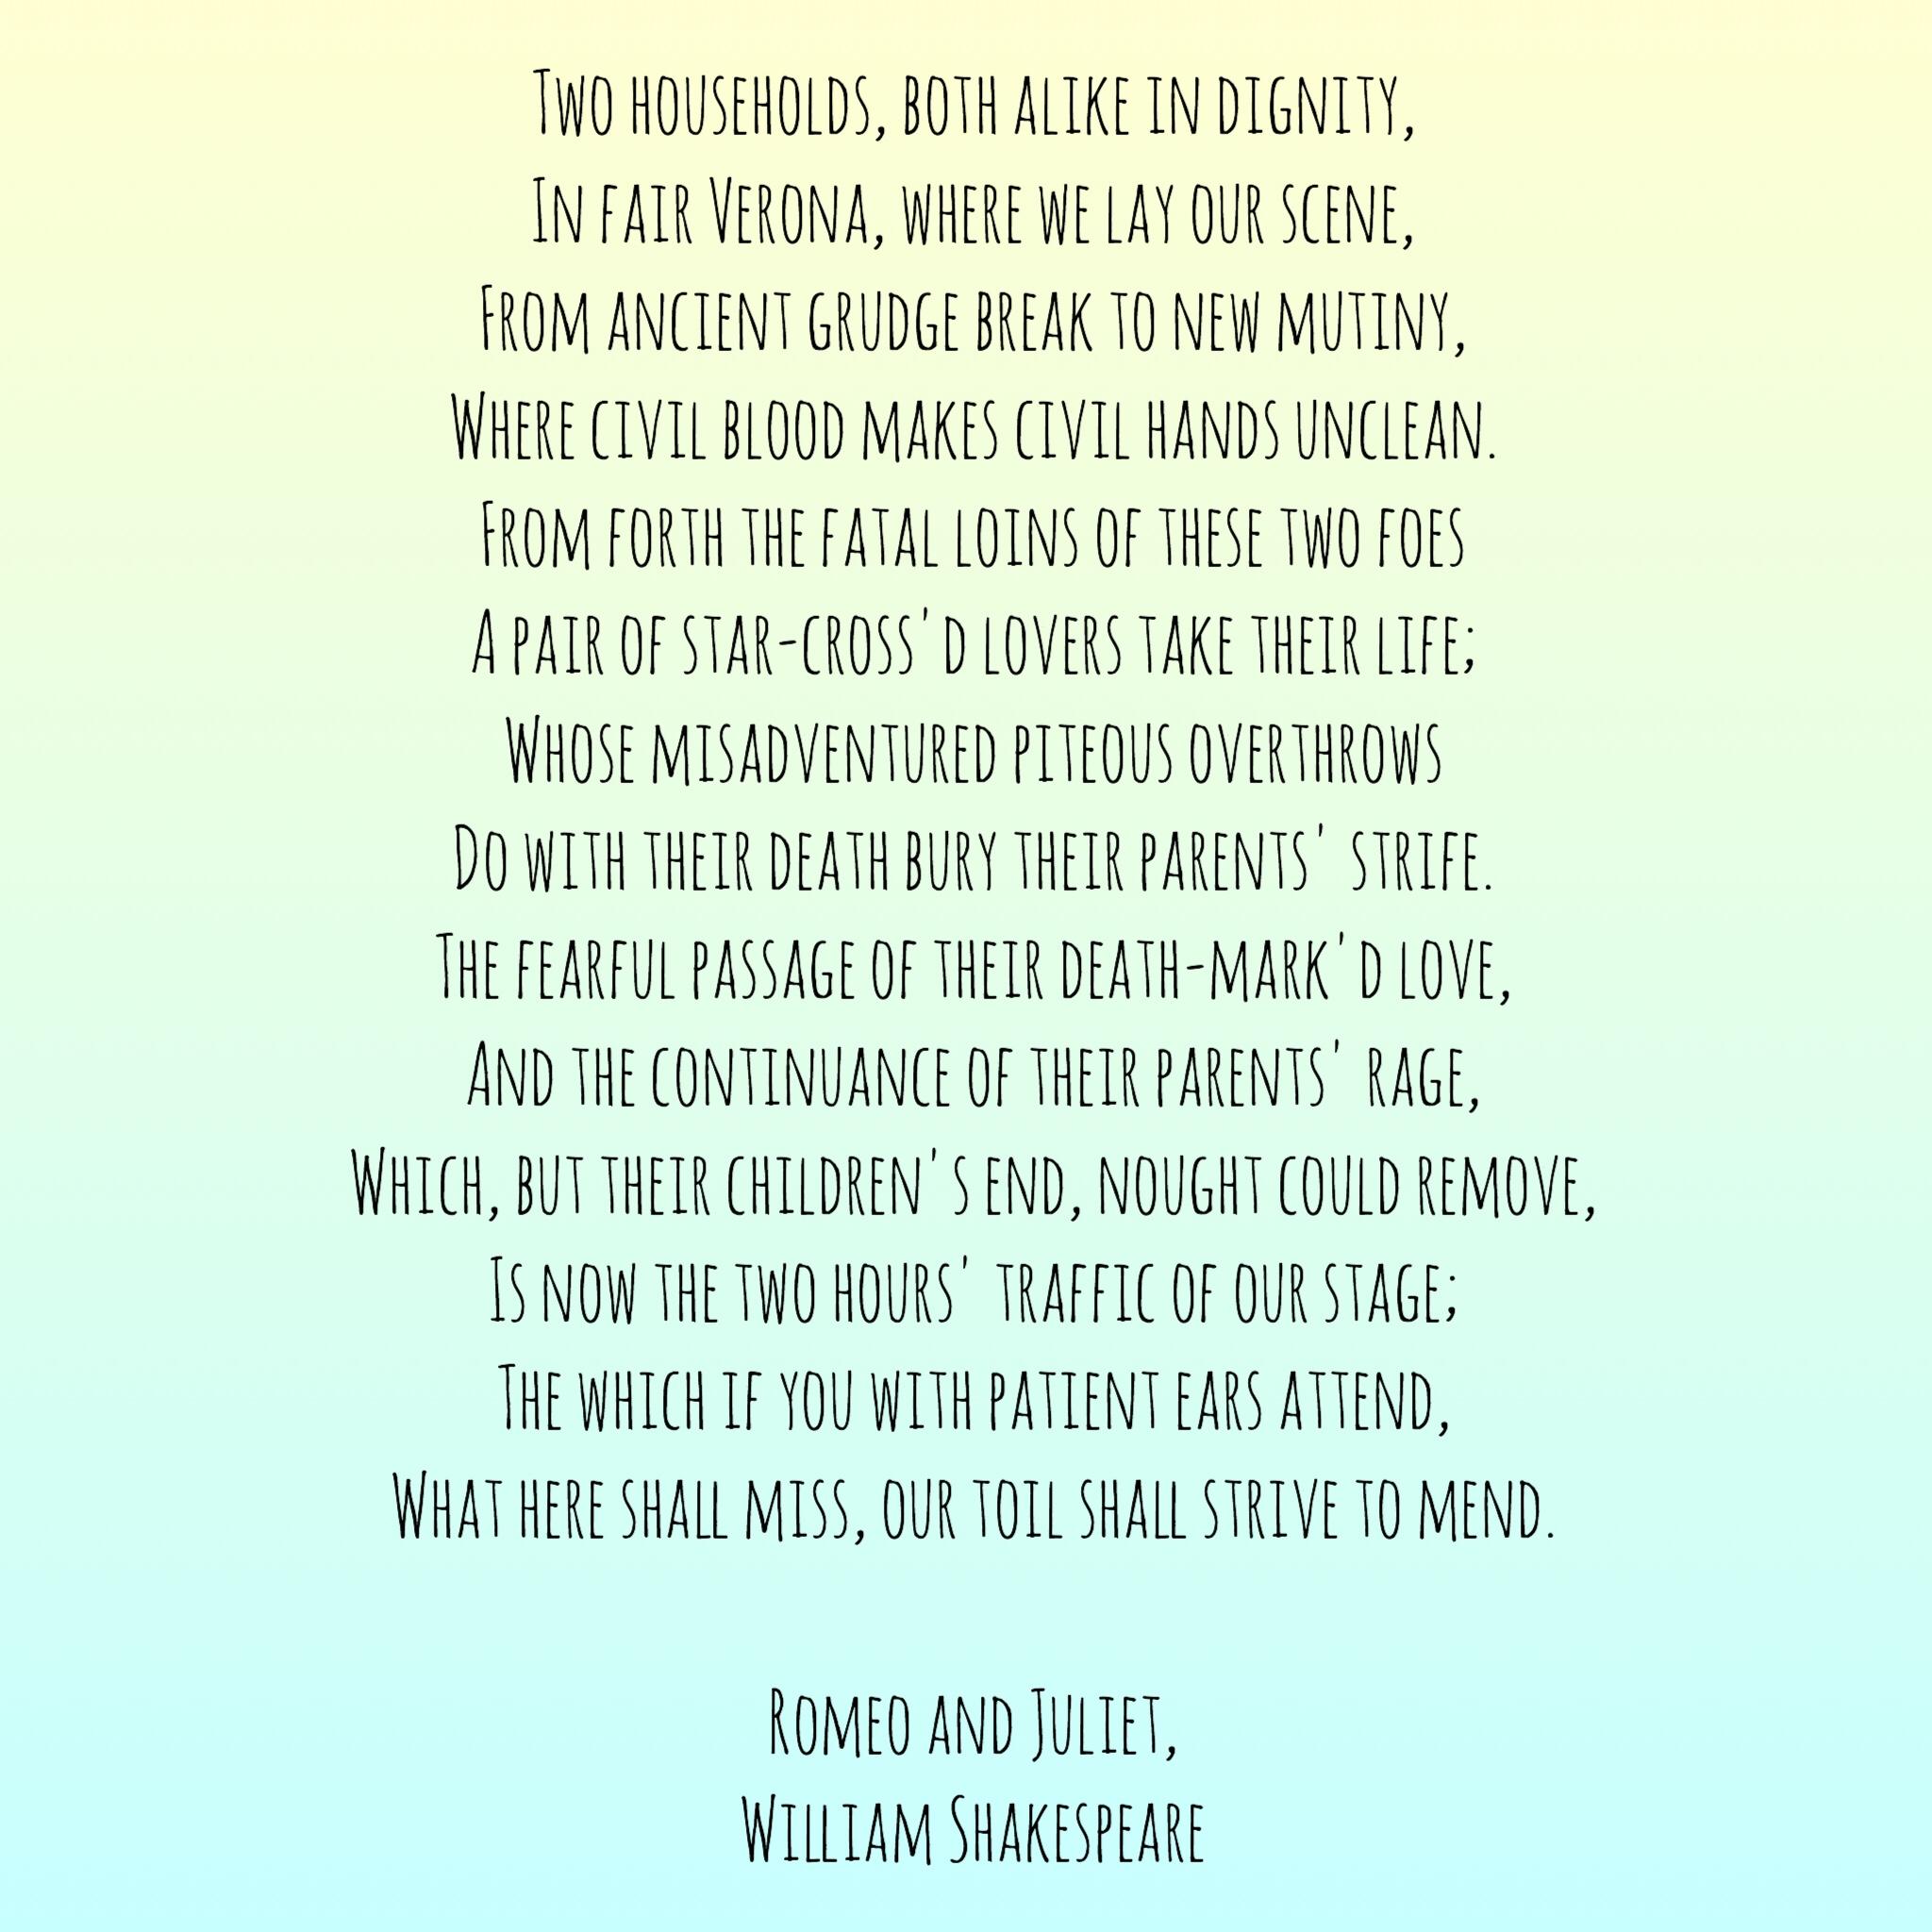 Prologue, Romeo and Juliet